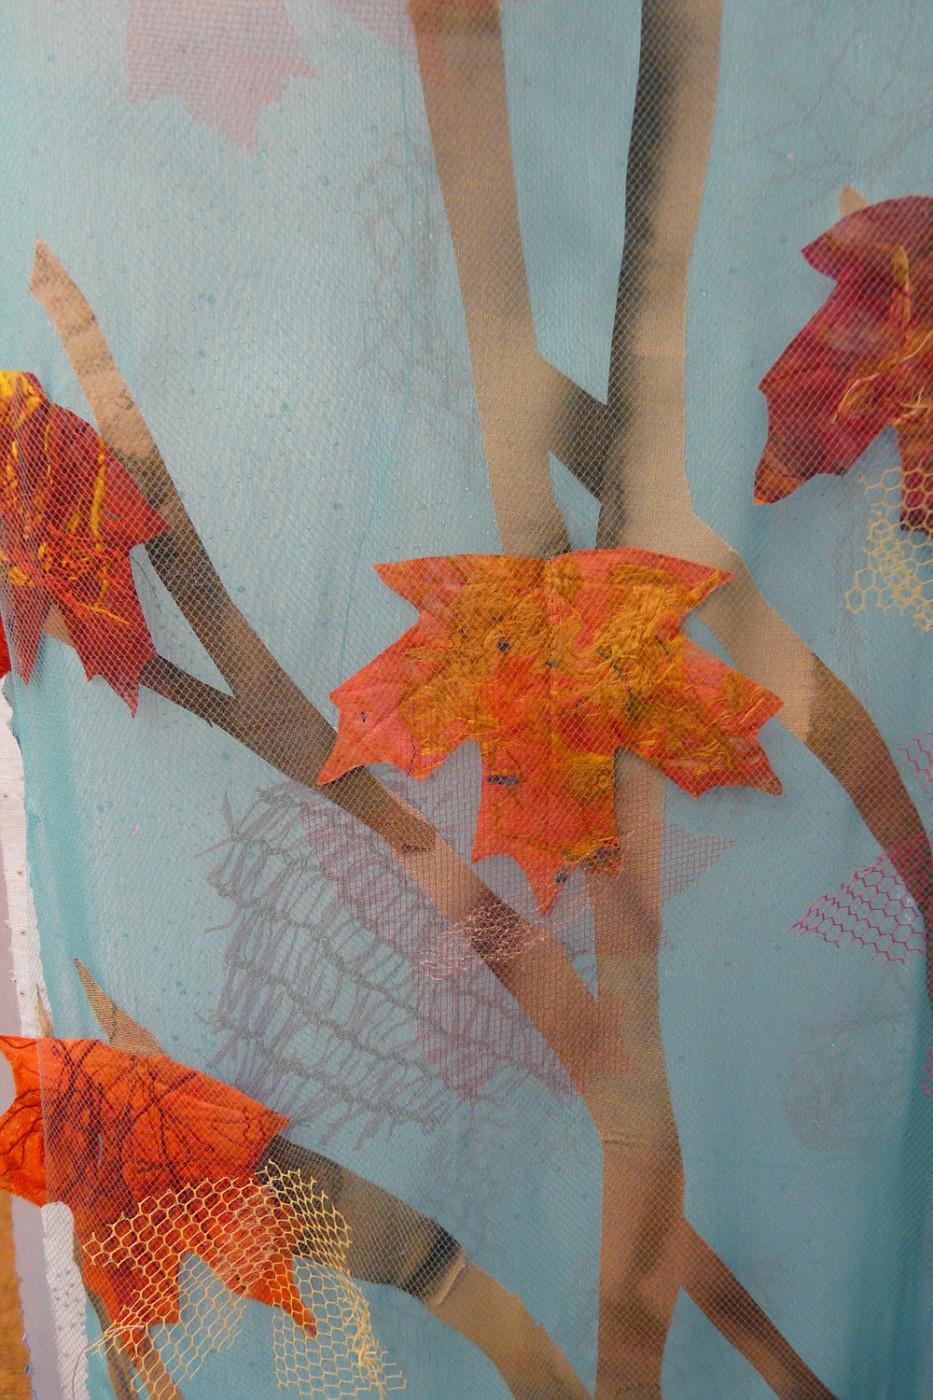 October: Azure, detail 2